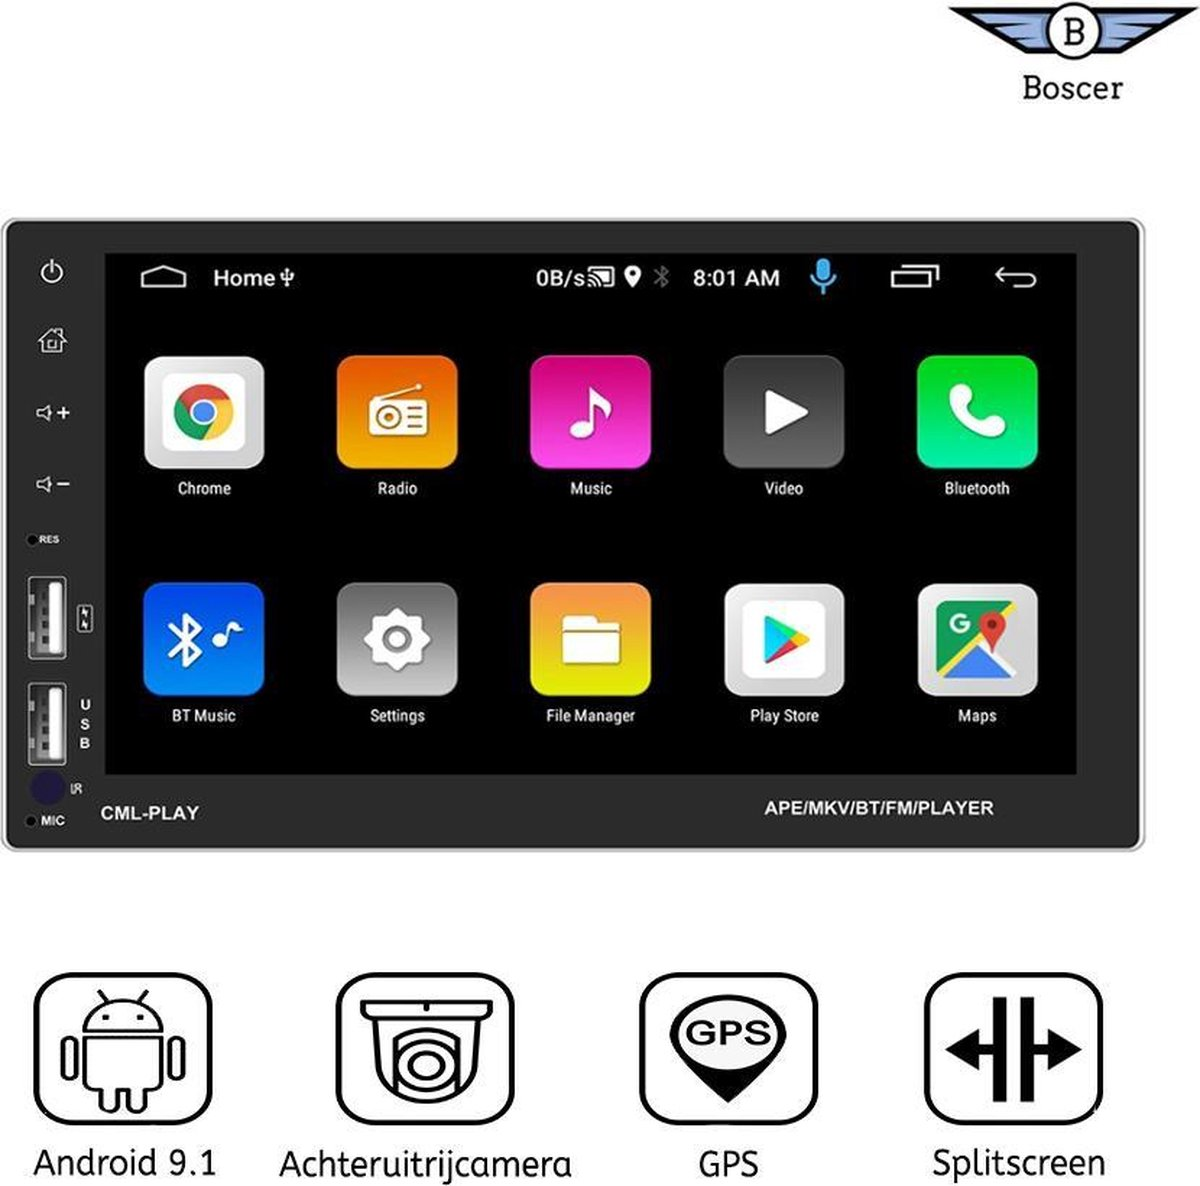 Boscer® Autoradio   Android 9.1   2Din universeel   Navigatiesysteem   Splitscreen   7' HD scherm   Achteruitrijcamera